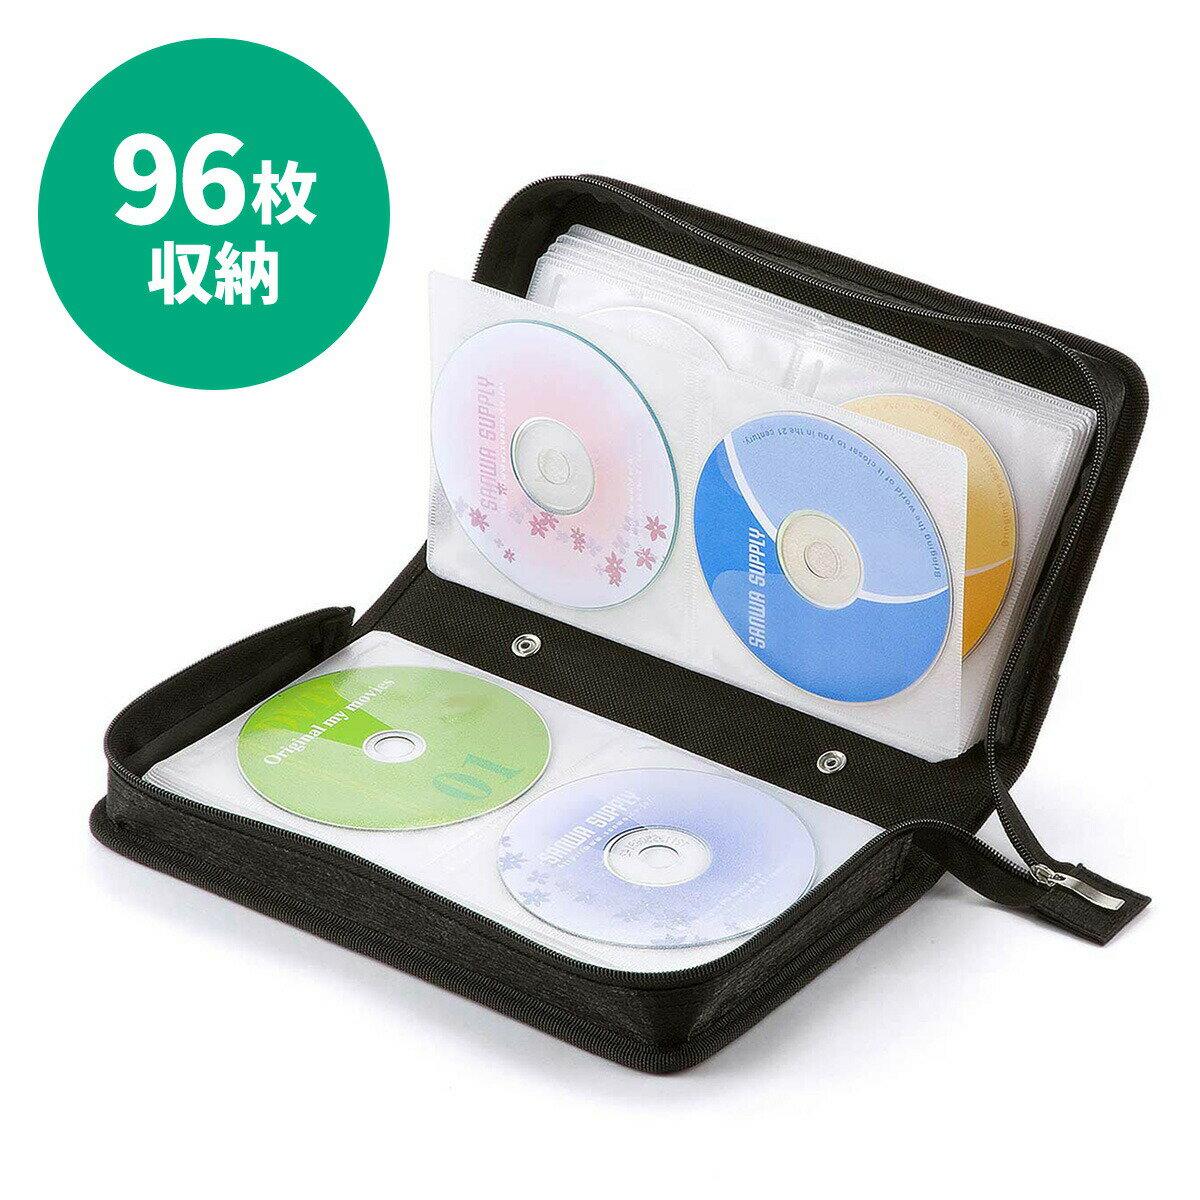 CDケース DVDケース キャリングケース 96枚収納 ファイル型 収納ケース メディアケース 持ち運び [200-FCD028]【サンワダイレクト限定品】